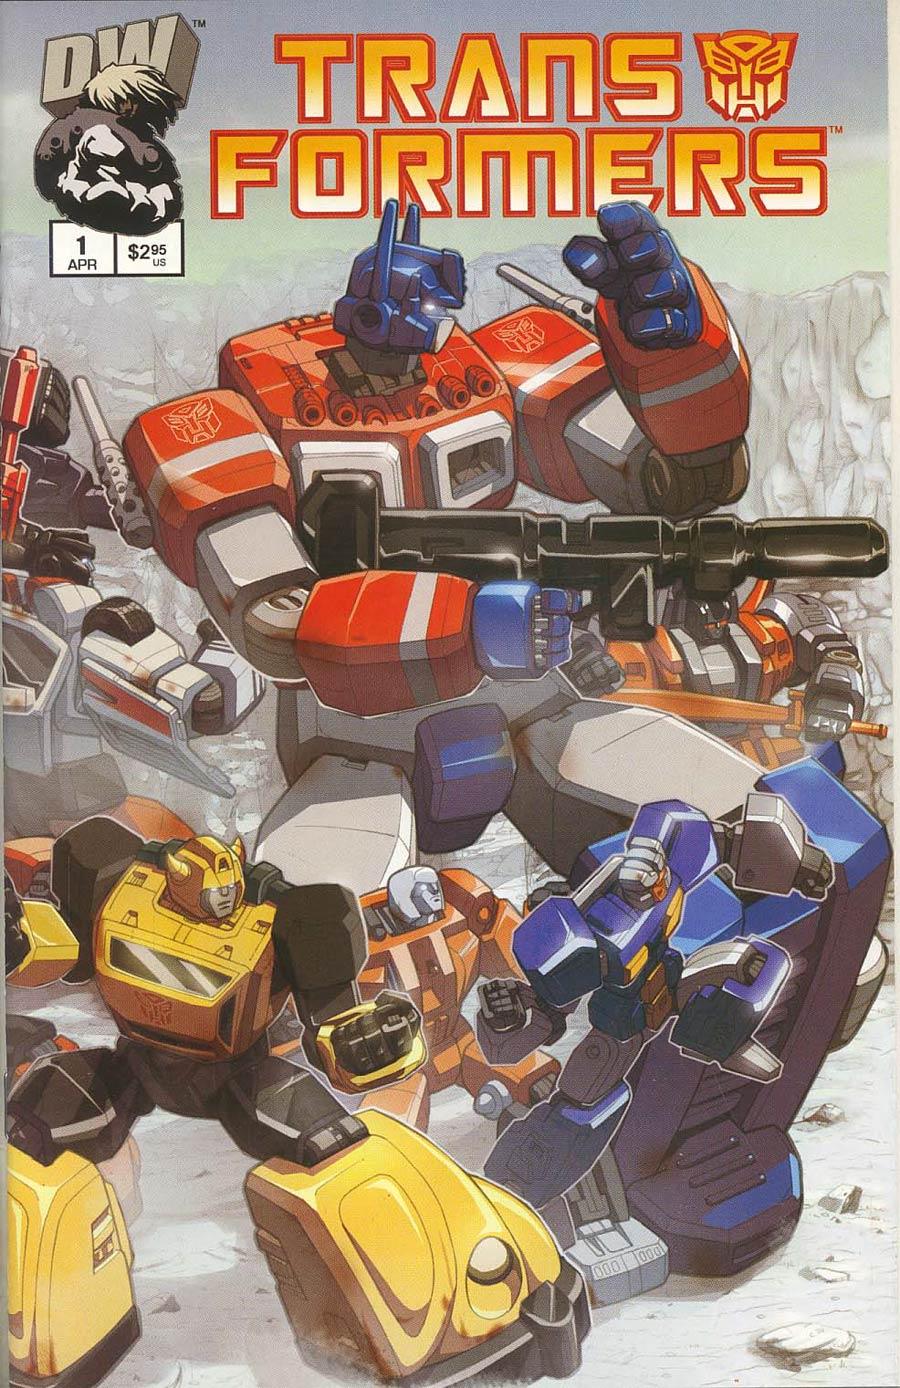 Transformers Generation 1 Vol 2 #1 Cvr A Autobot